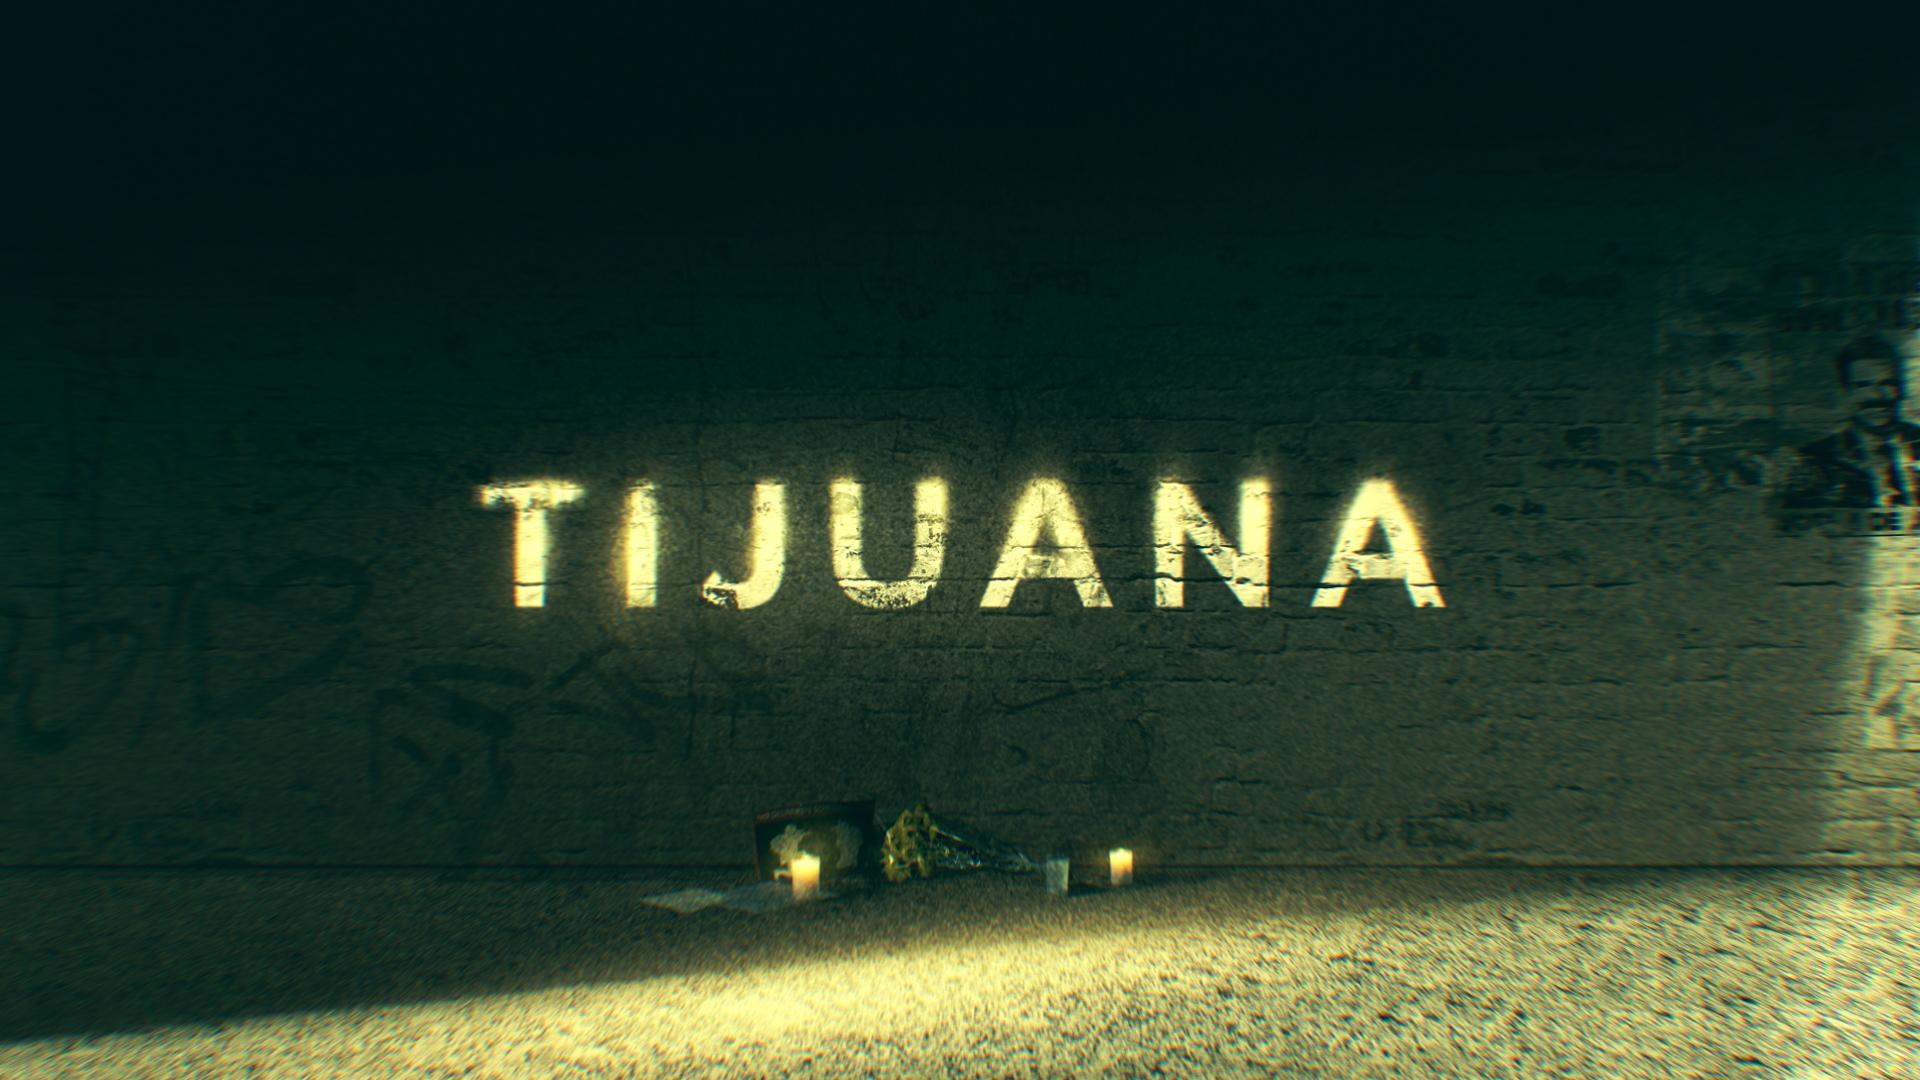 Tijuana_Styleframes__26.jpg